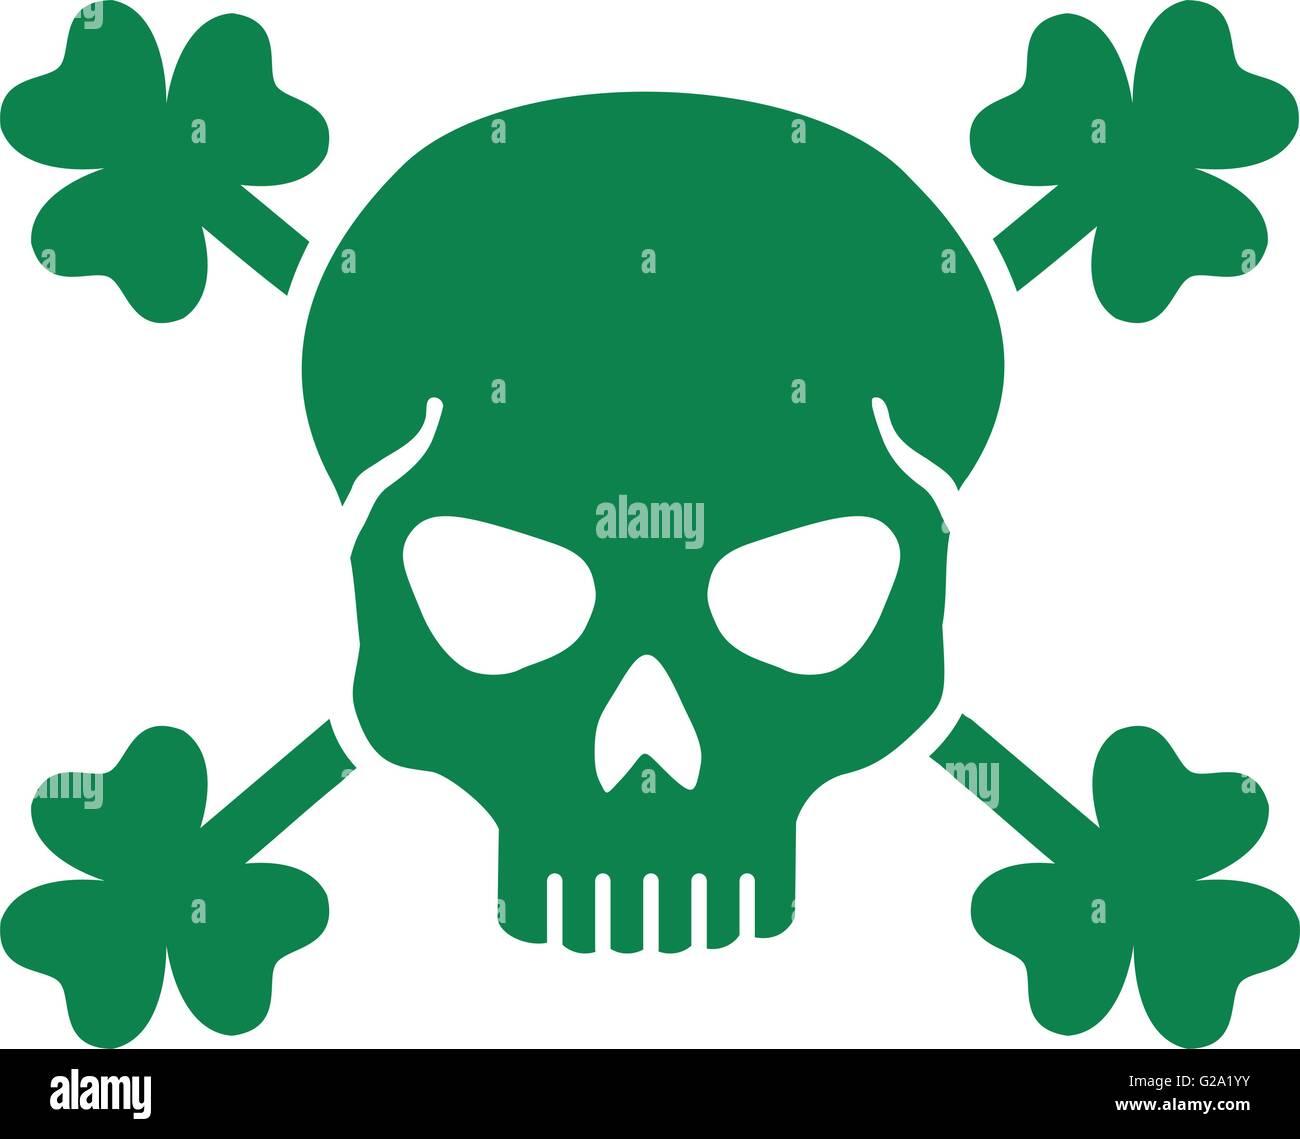 Green st patricks day skull with clovers stock vector art green st patricks day skull with clovers biocorpaavc